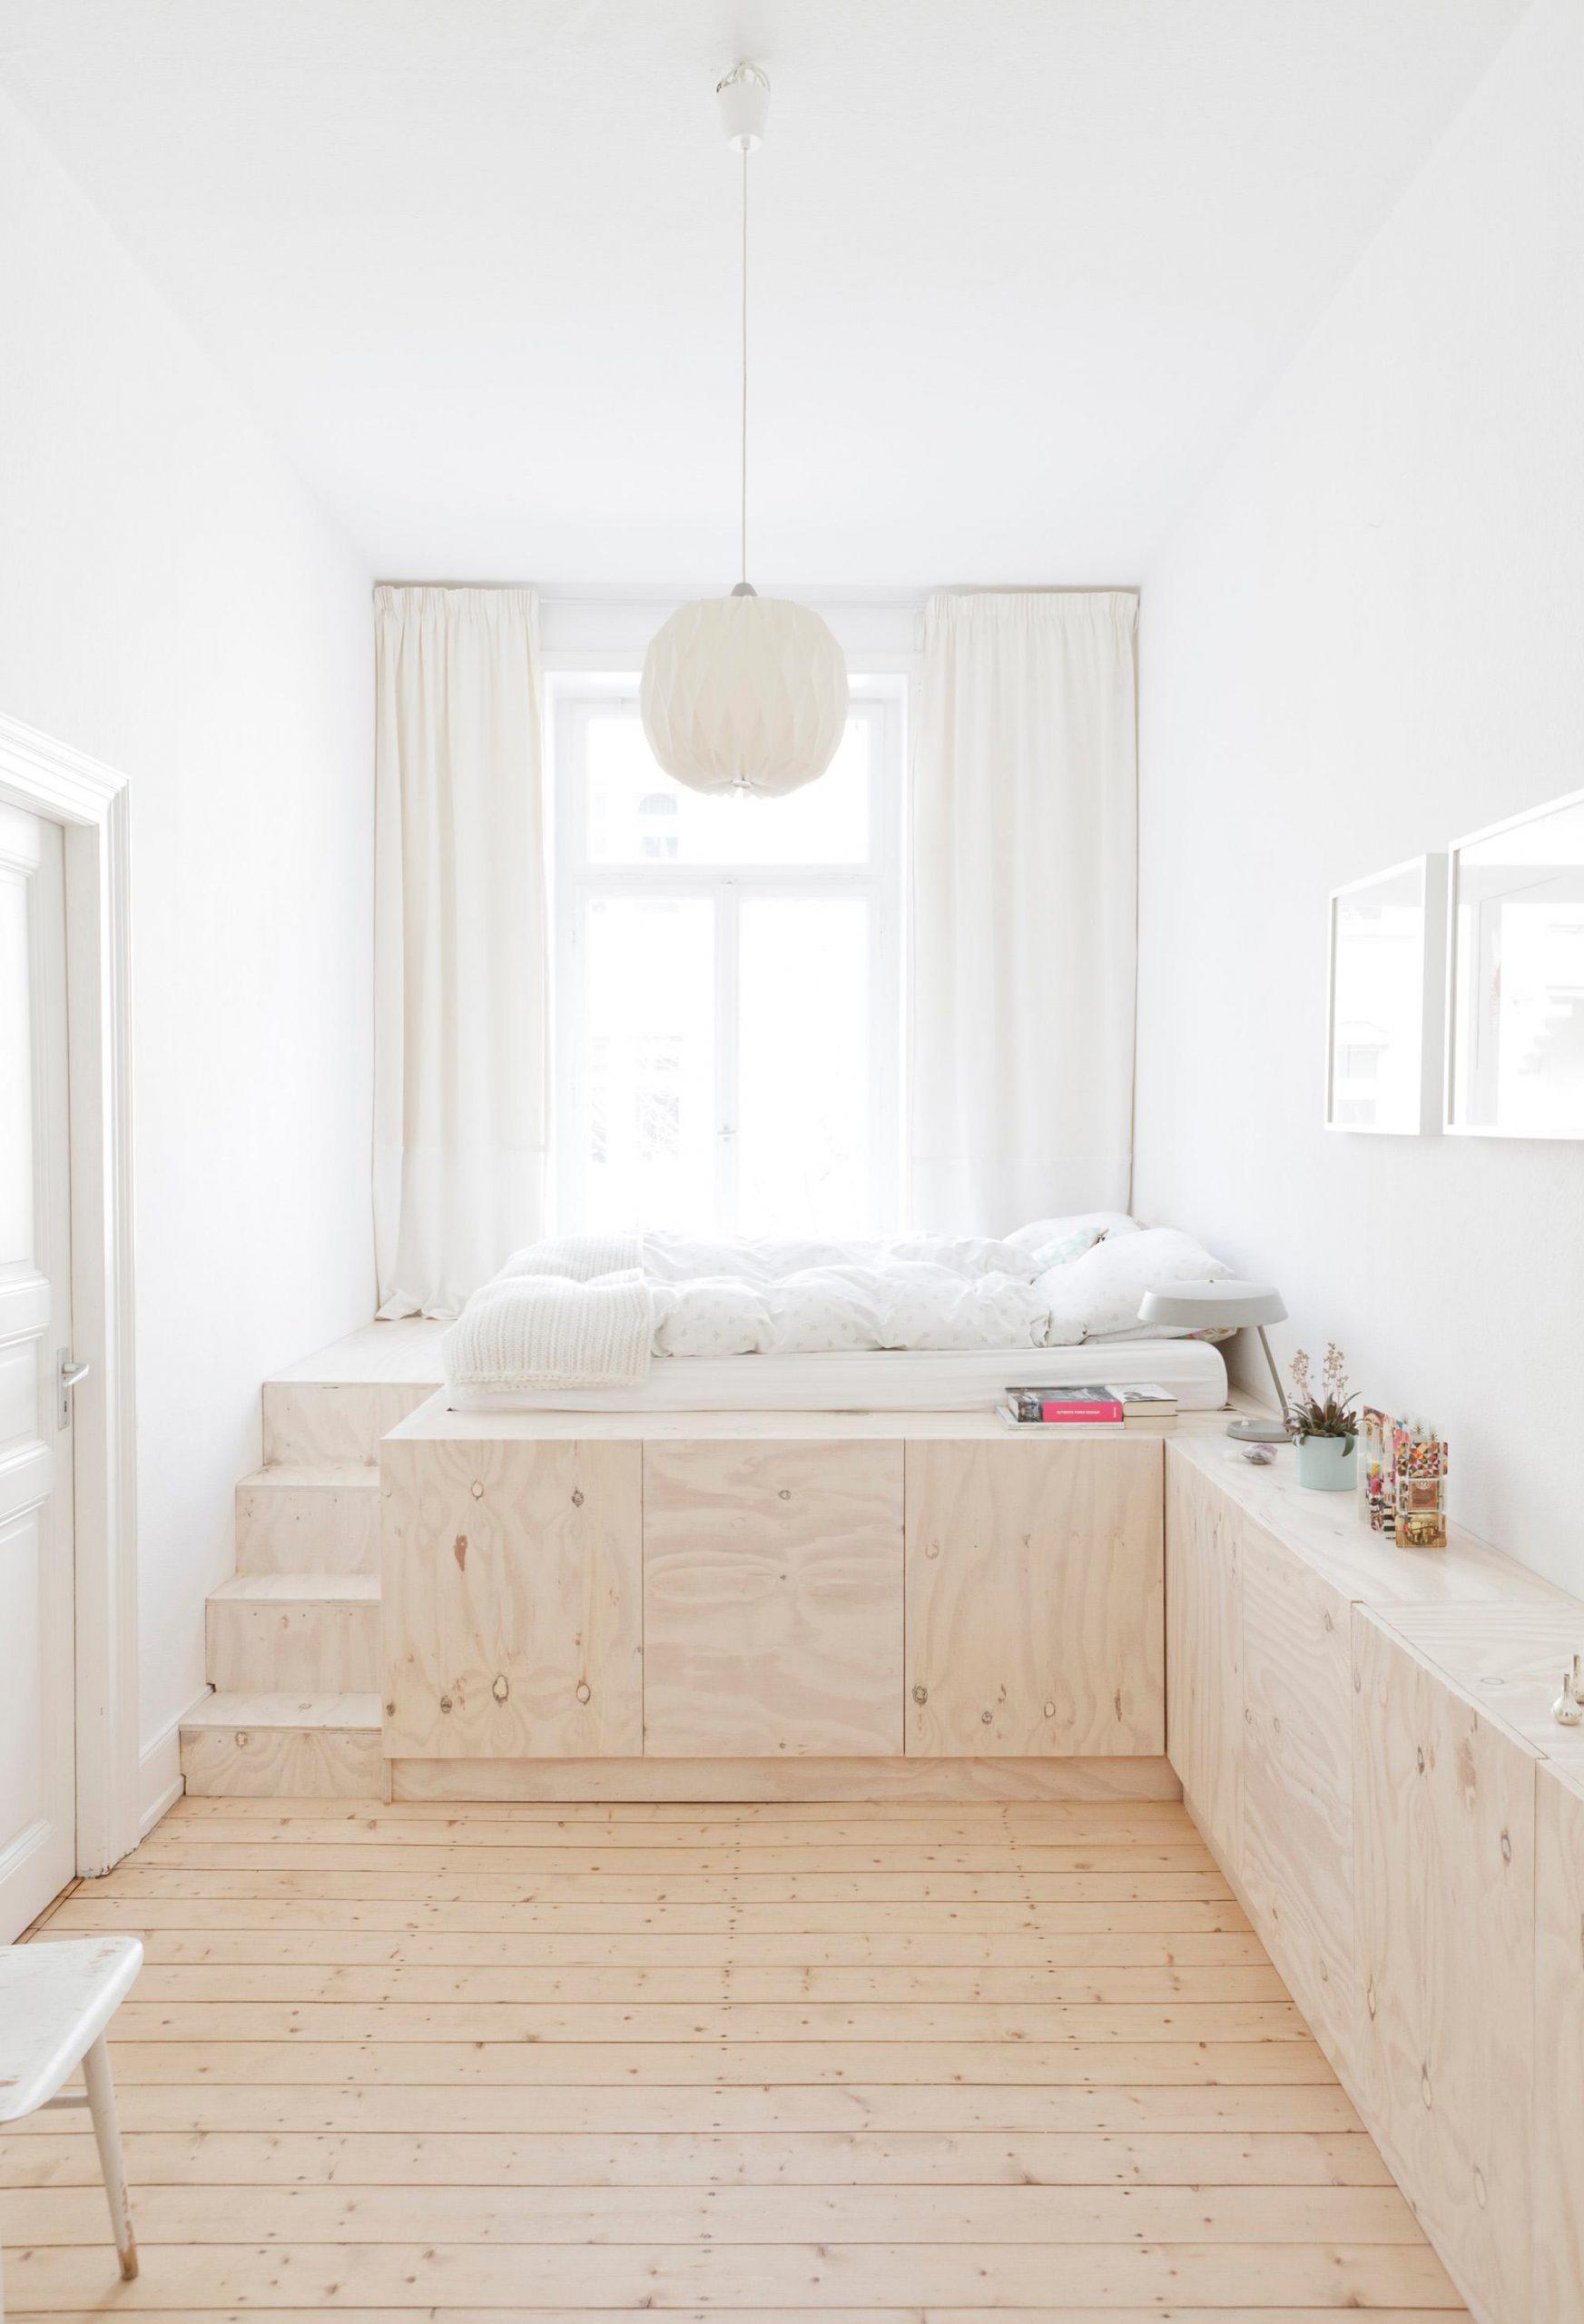 Full Size of Podest Bett Podestbett Bauen Ikea Selber Kosten Darunter Stauraum 160x200 Kaufen Hack Selbst Mit Diy Schlafzimmer Sideboard Bettpodest Kombination B 120x200 Bett Podest Bett